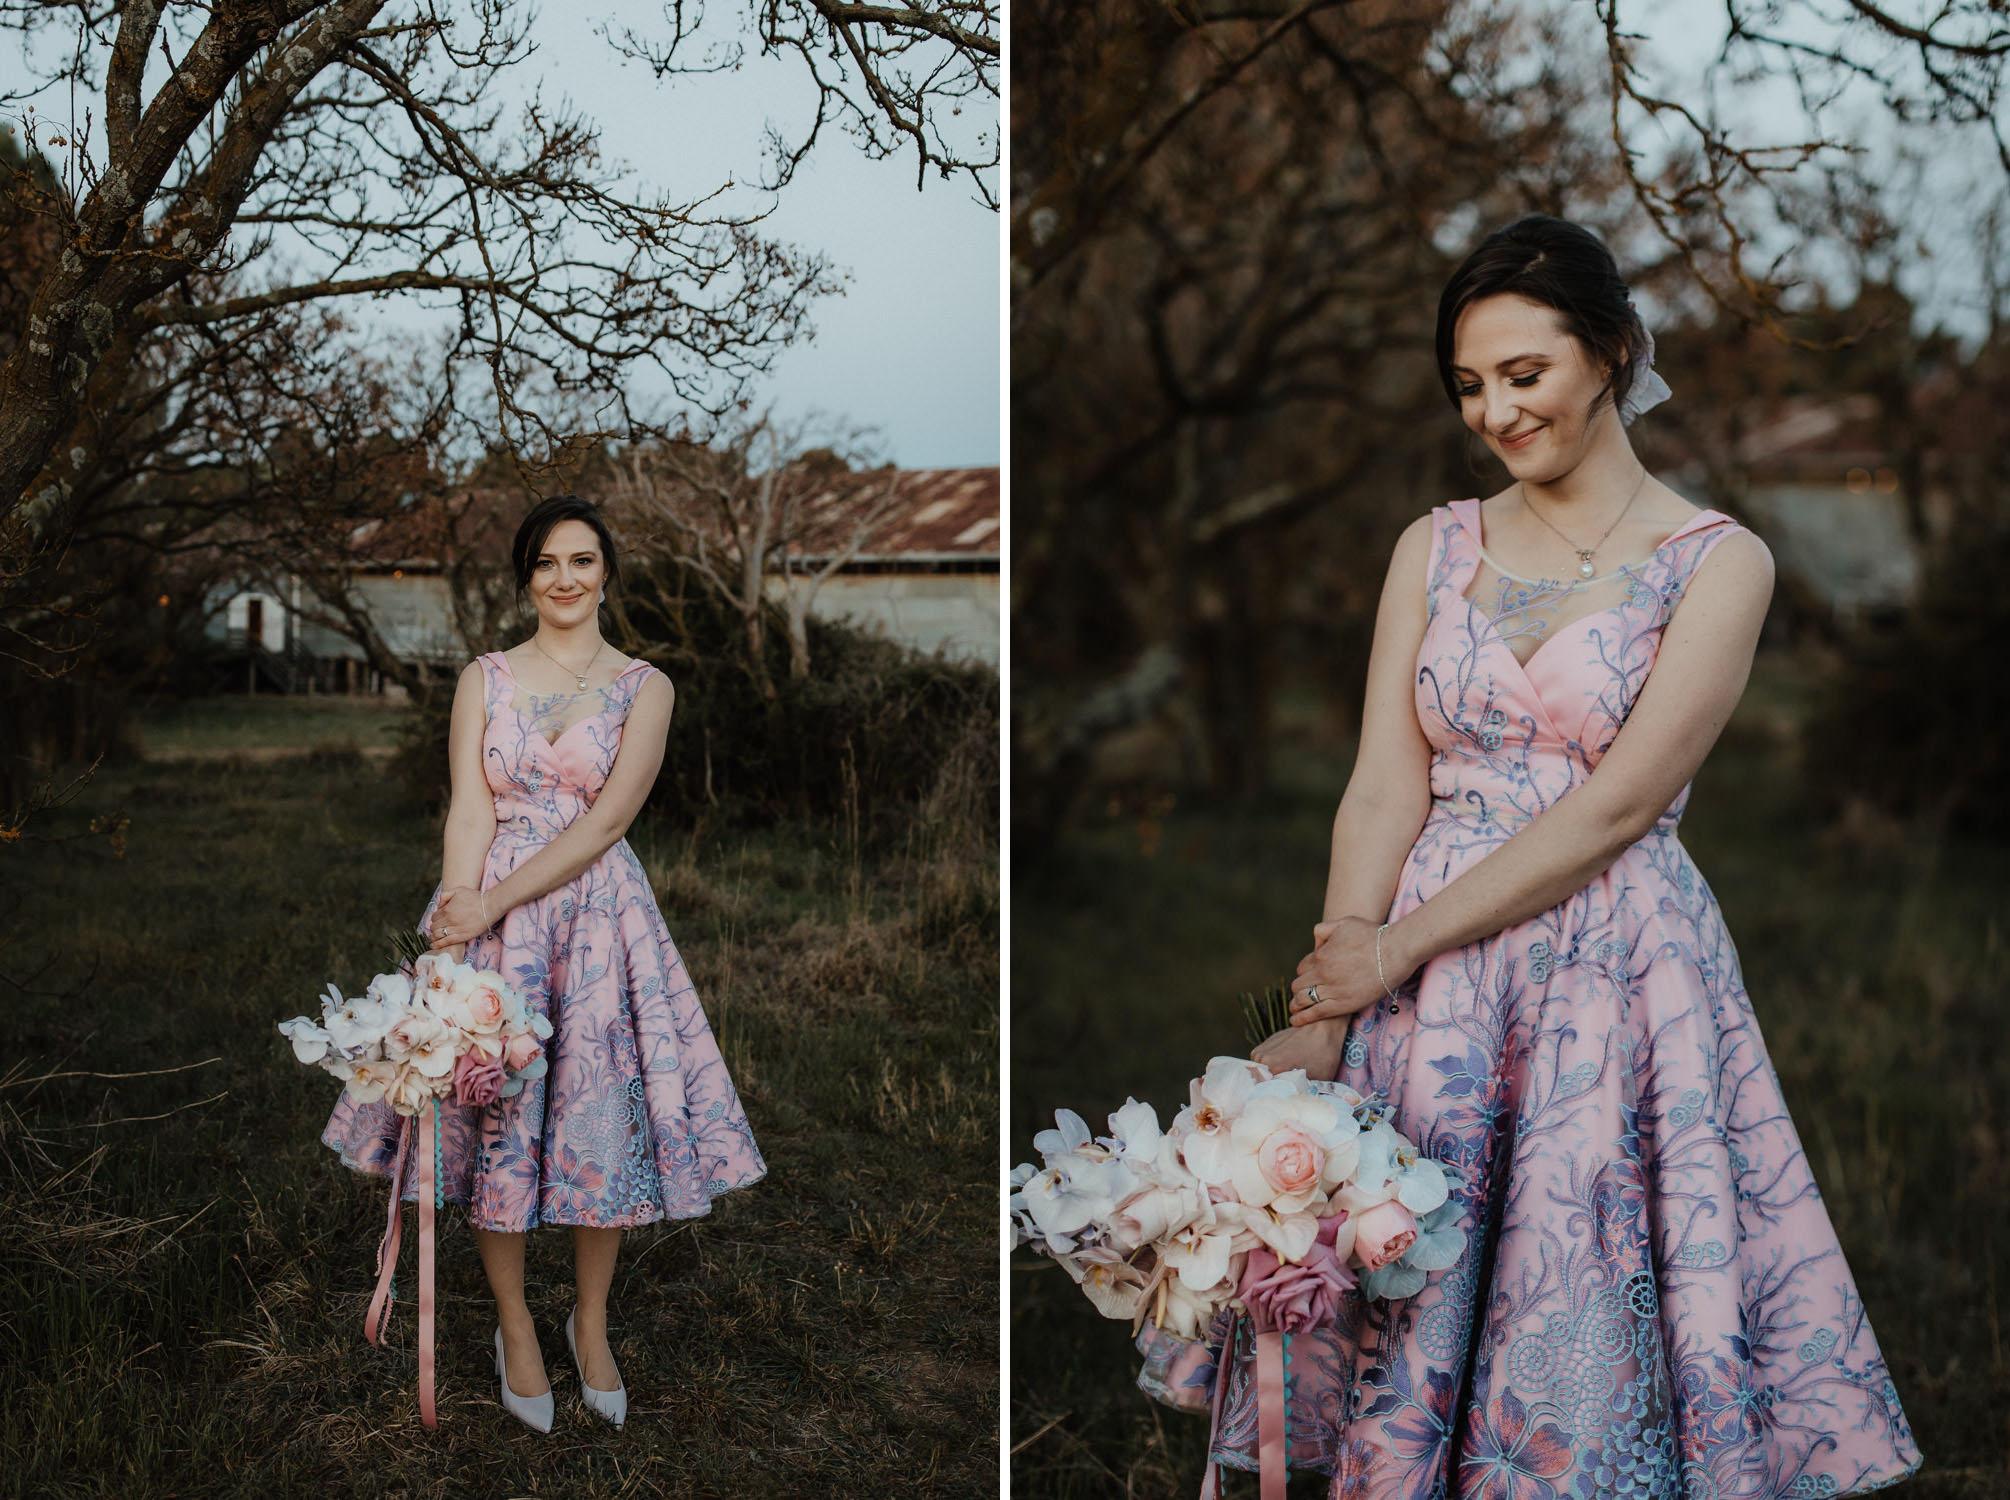 alternative-wedding-australia-non-traditional_98.jpg